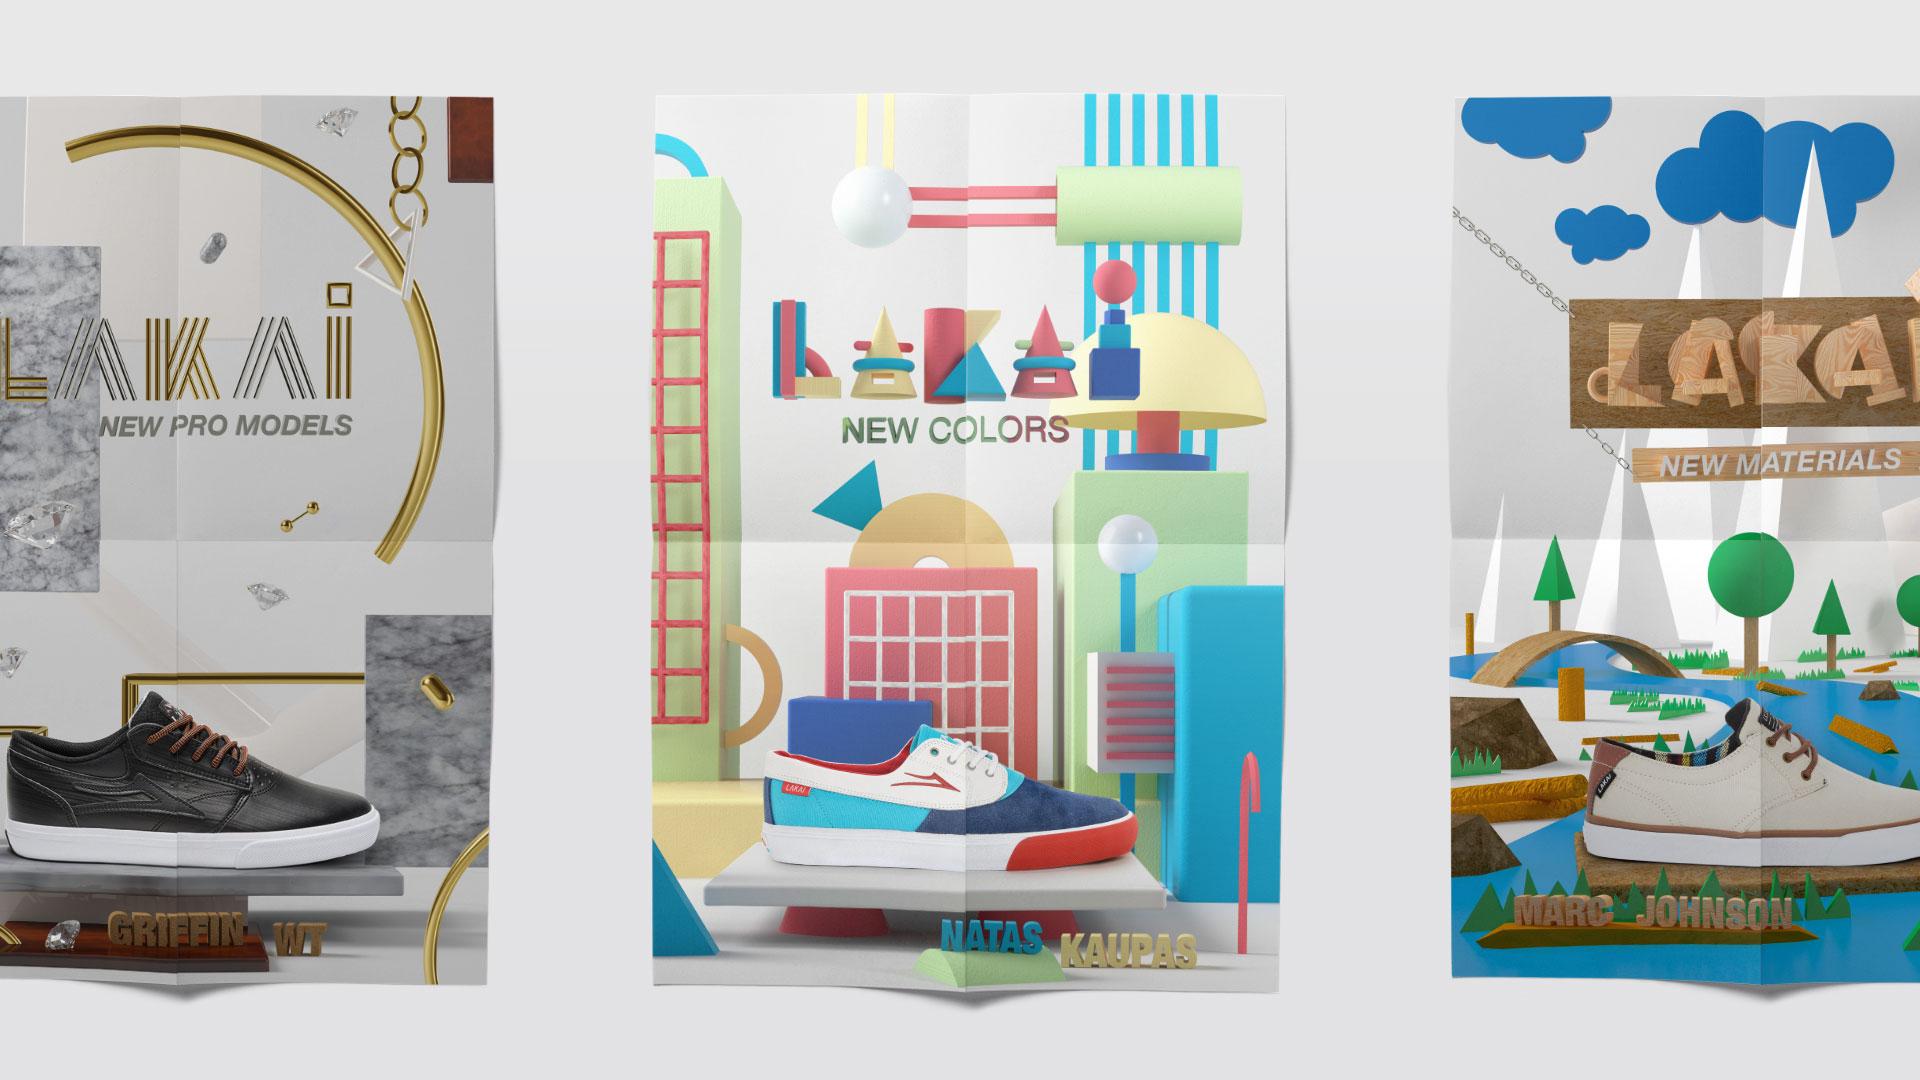 3_advertising_lakai_shoes_artdirection_serie